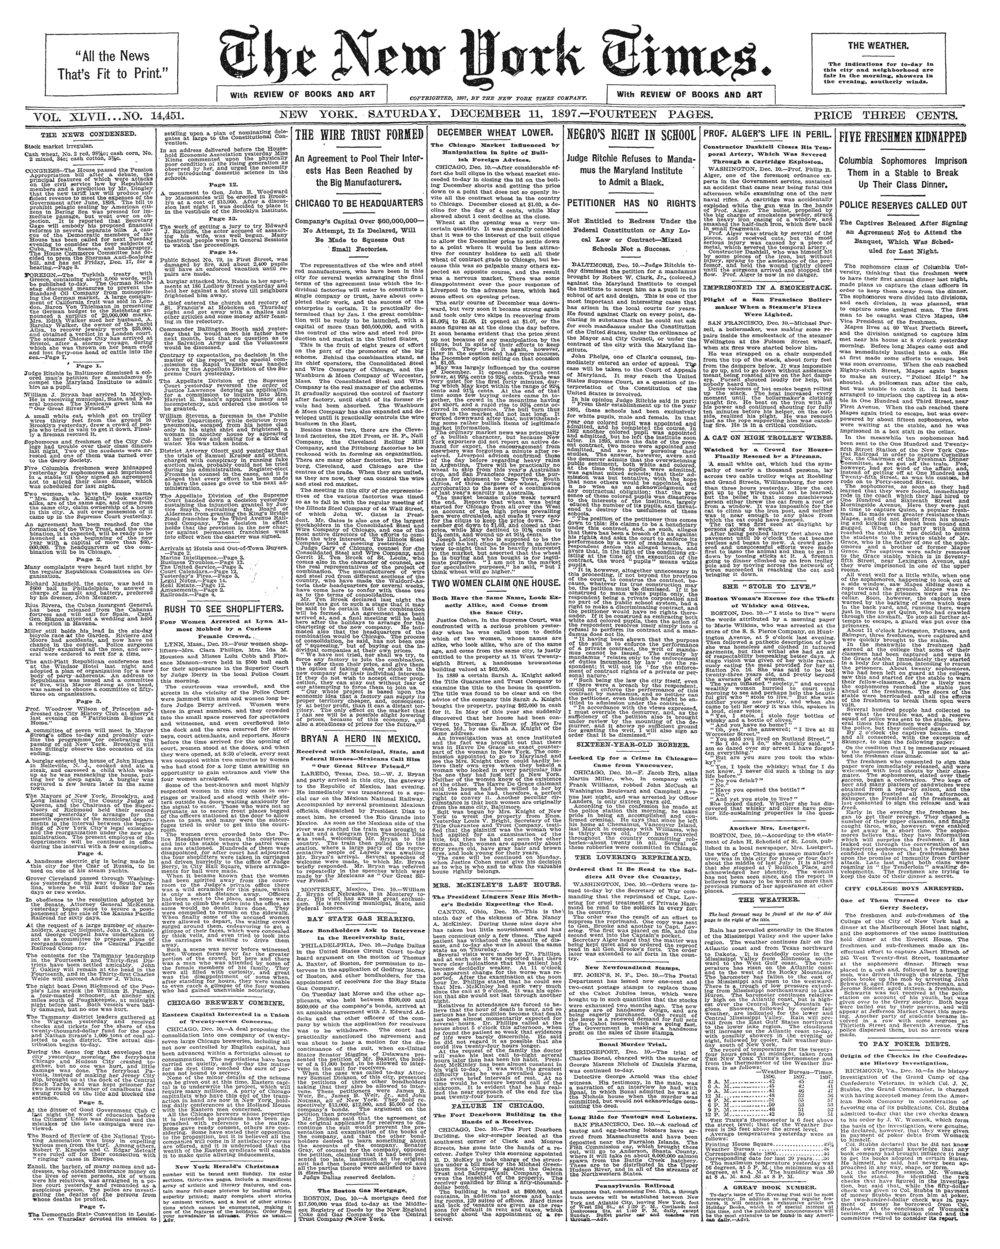 1897-12-11-NEGRO'S_RIGHT_IN_SCHOOL_J.jpg